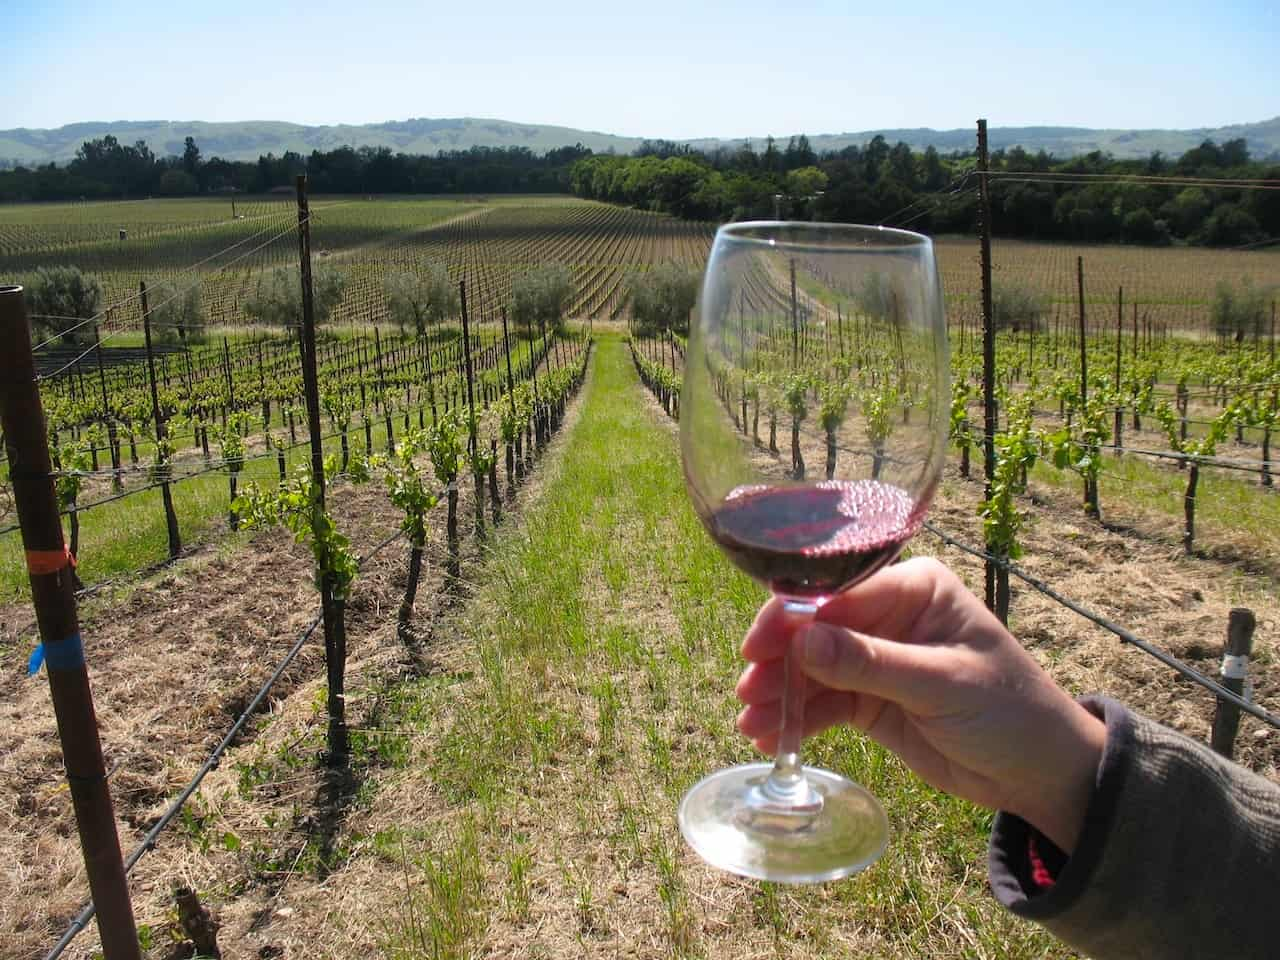 Sonoma County Wine Country Maps - Sonoma.com